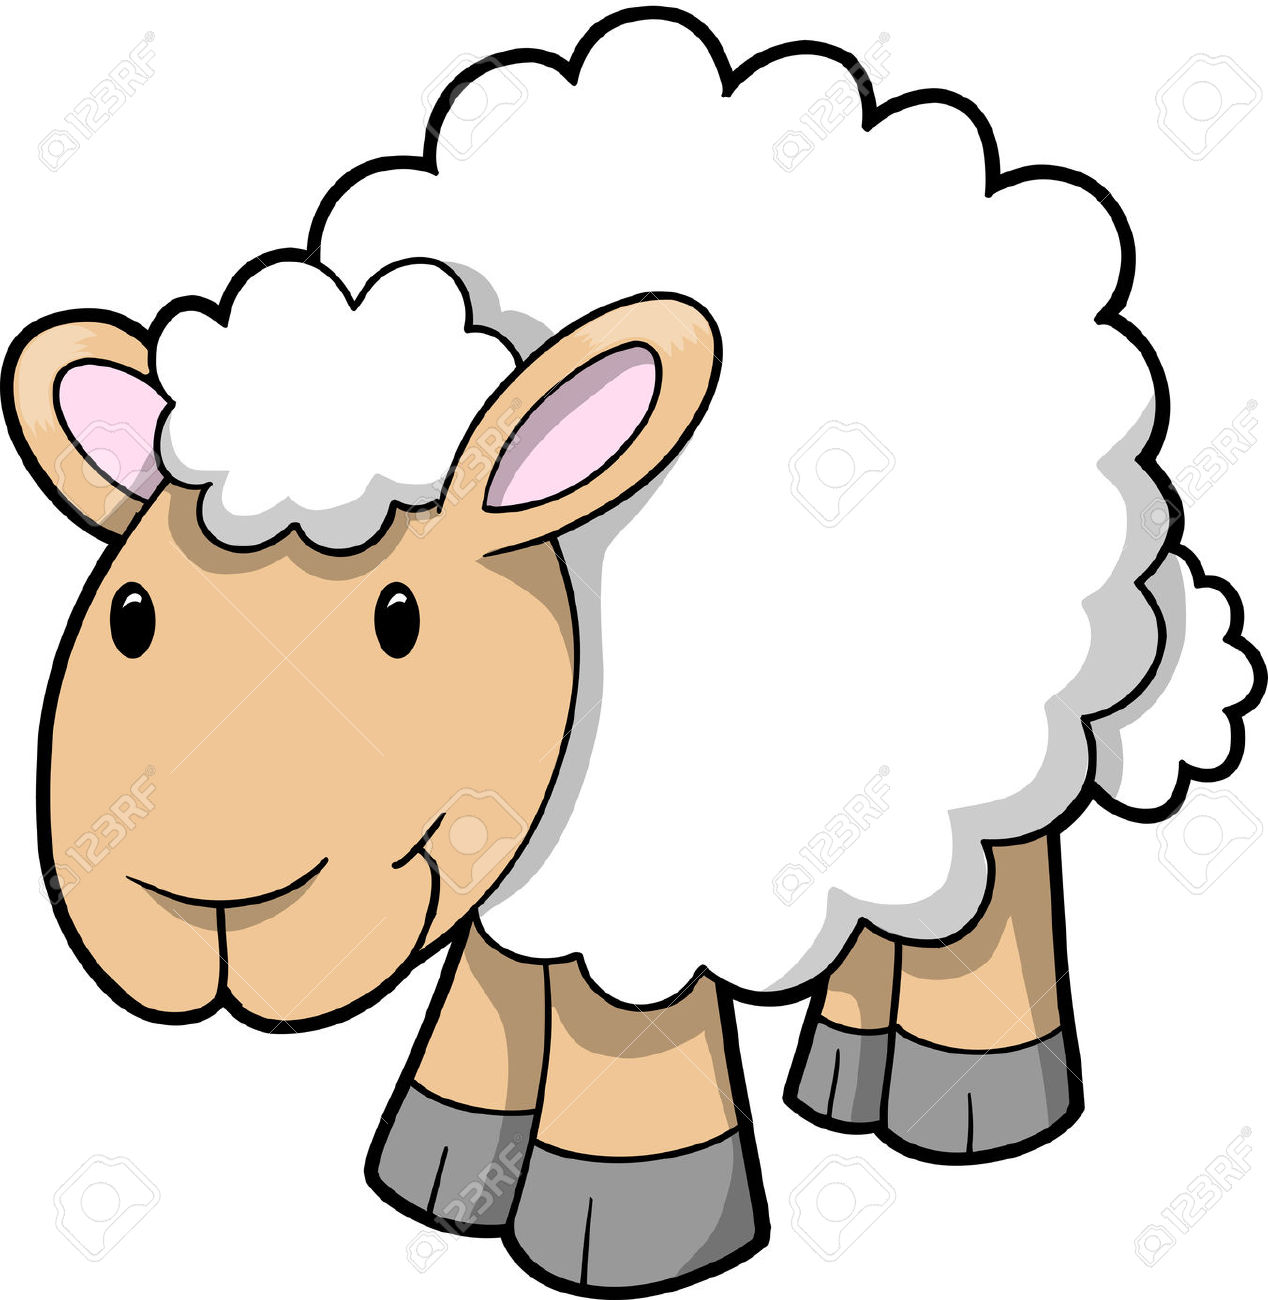 PNG Sheep Cartoon - 85539